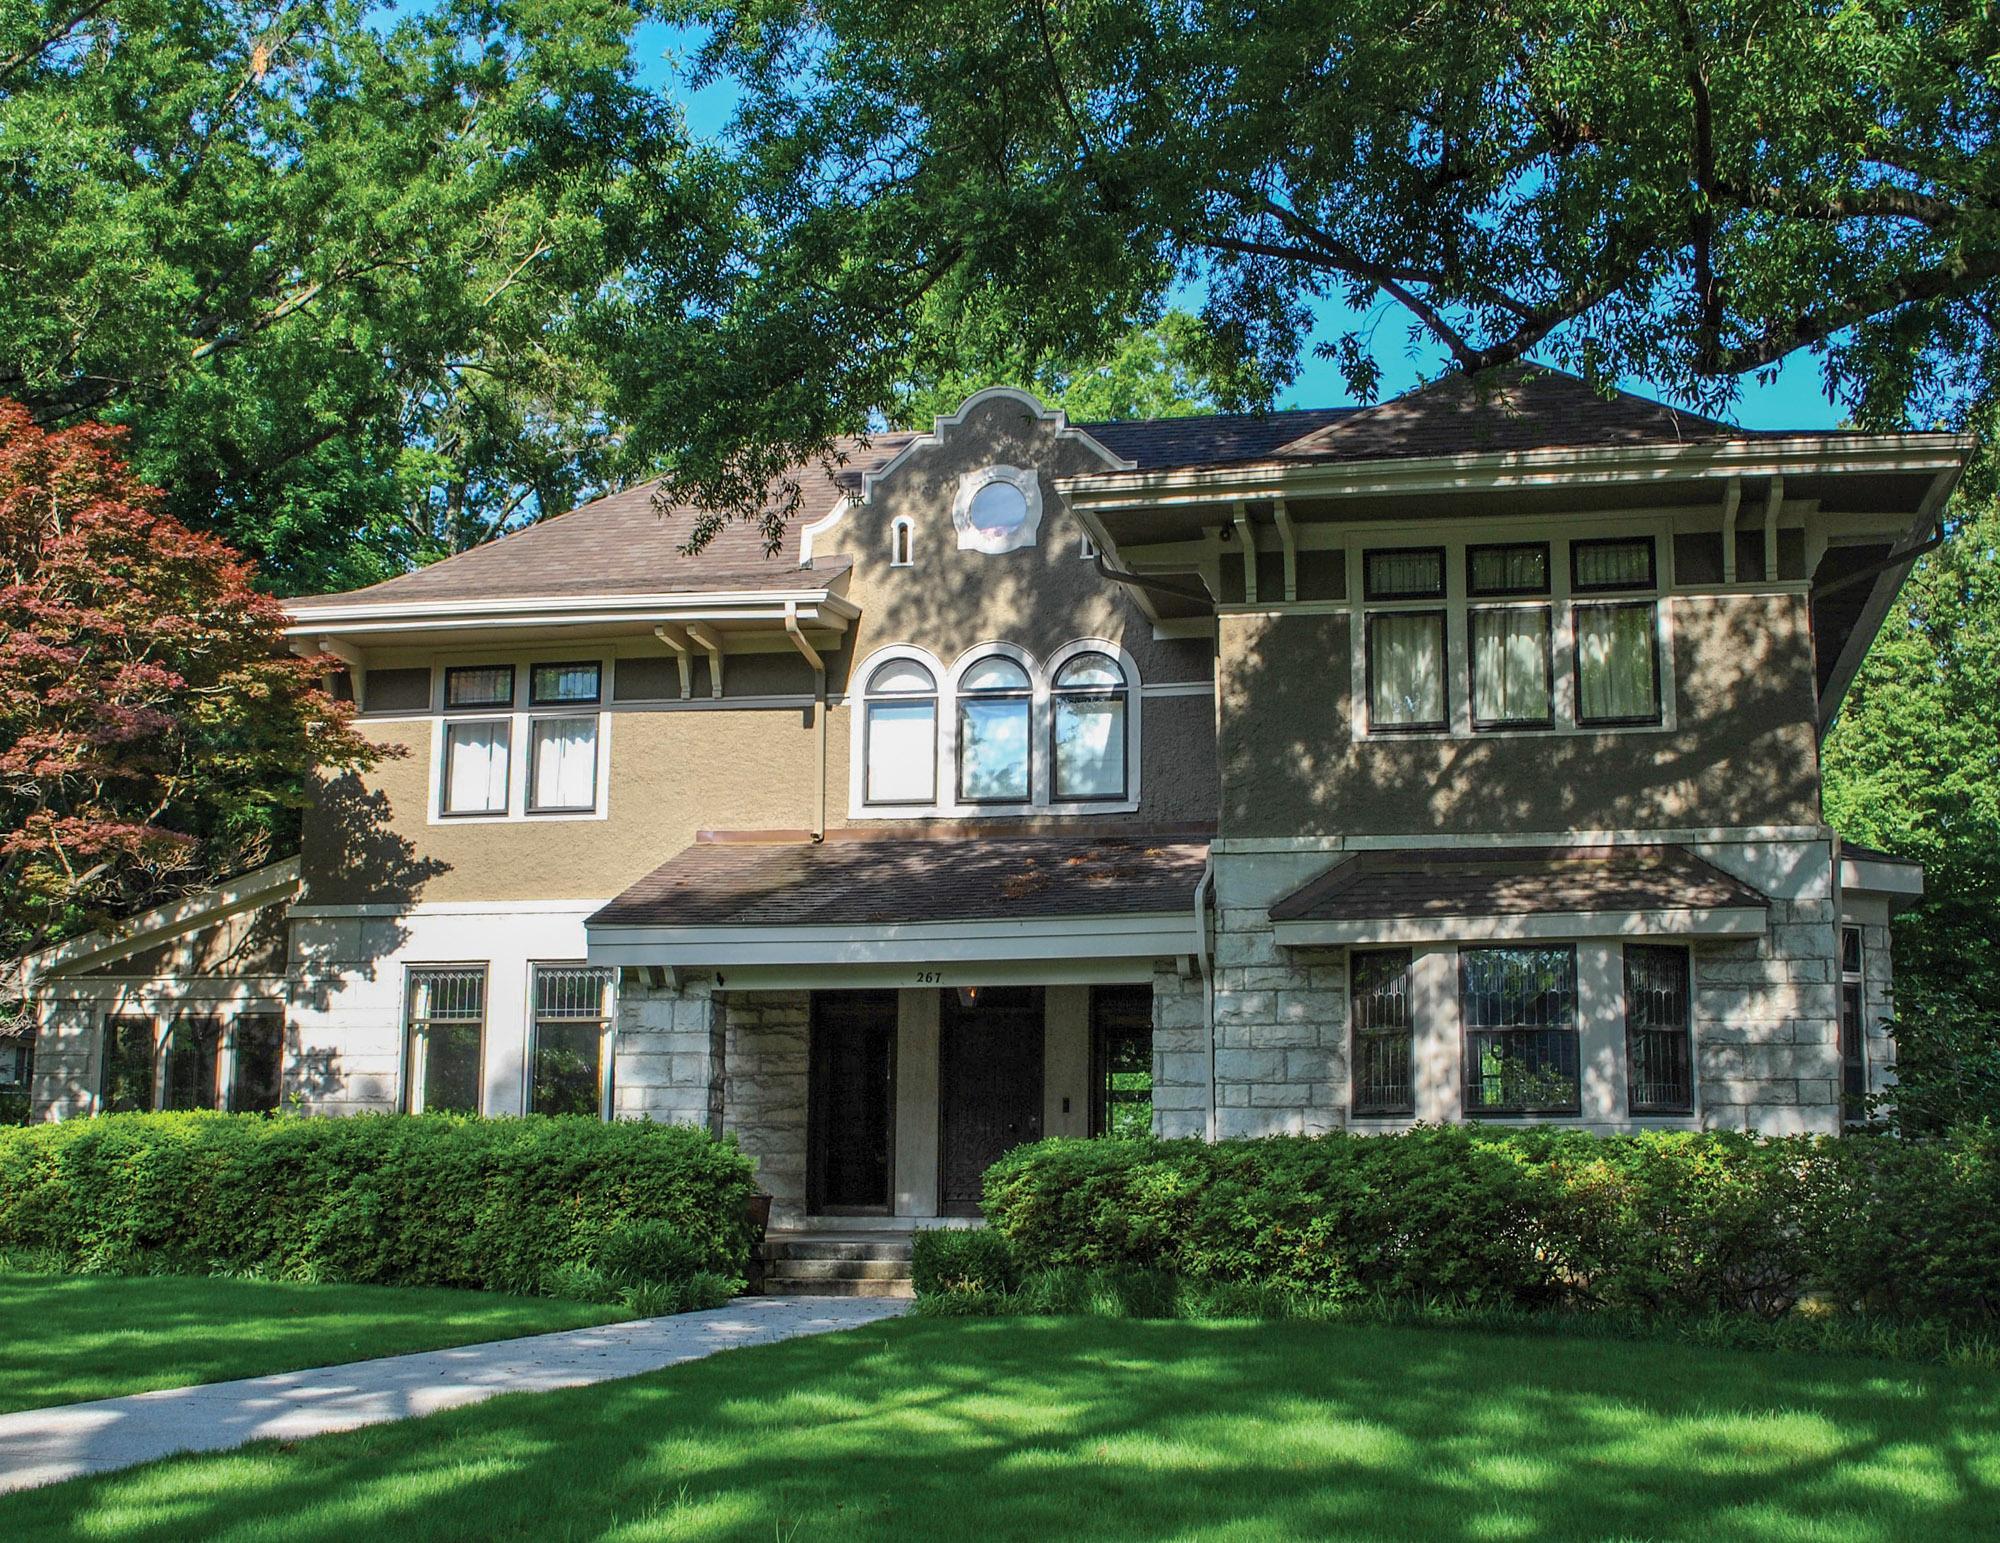 1909 Mission Revival Boyle House